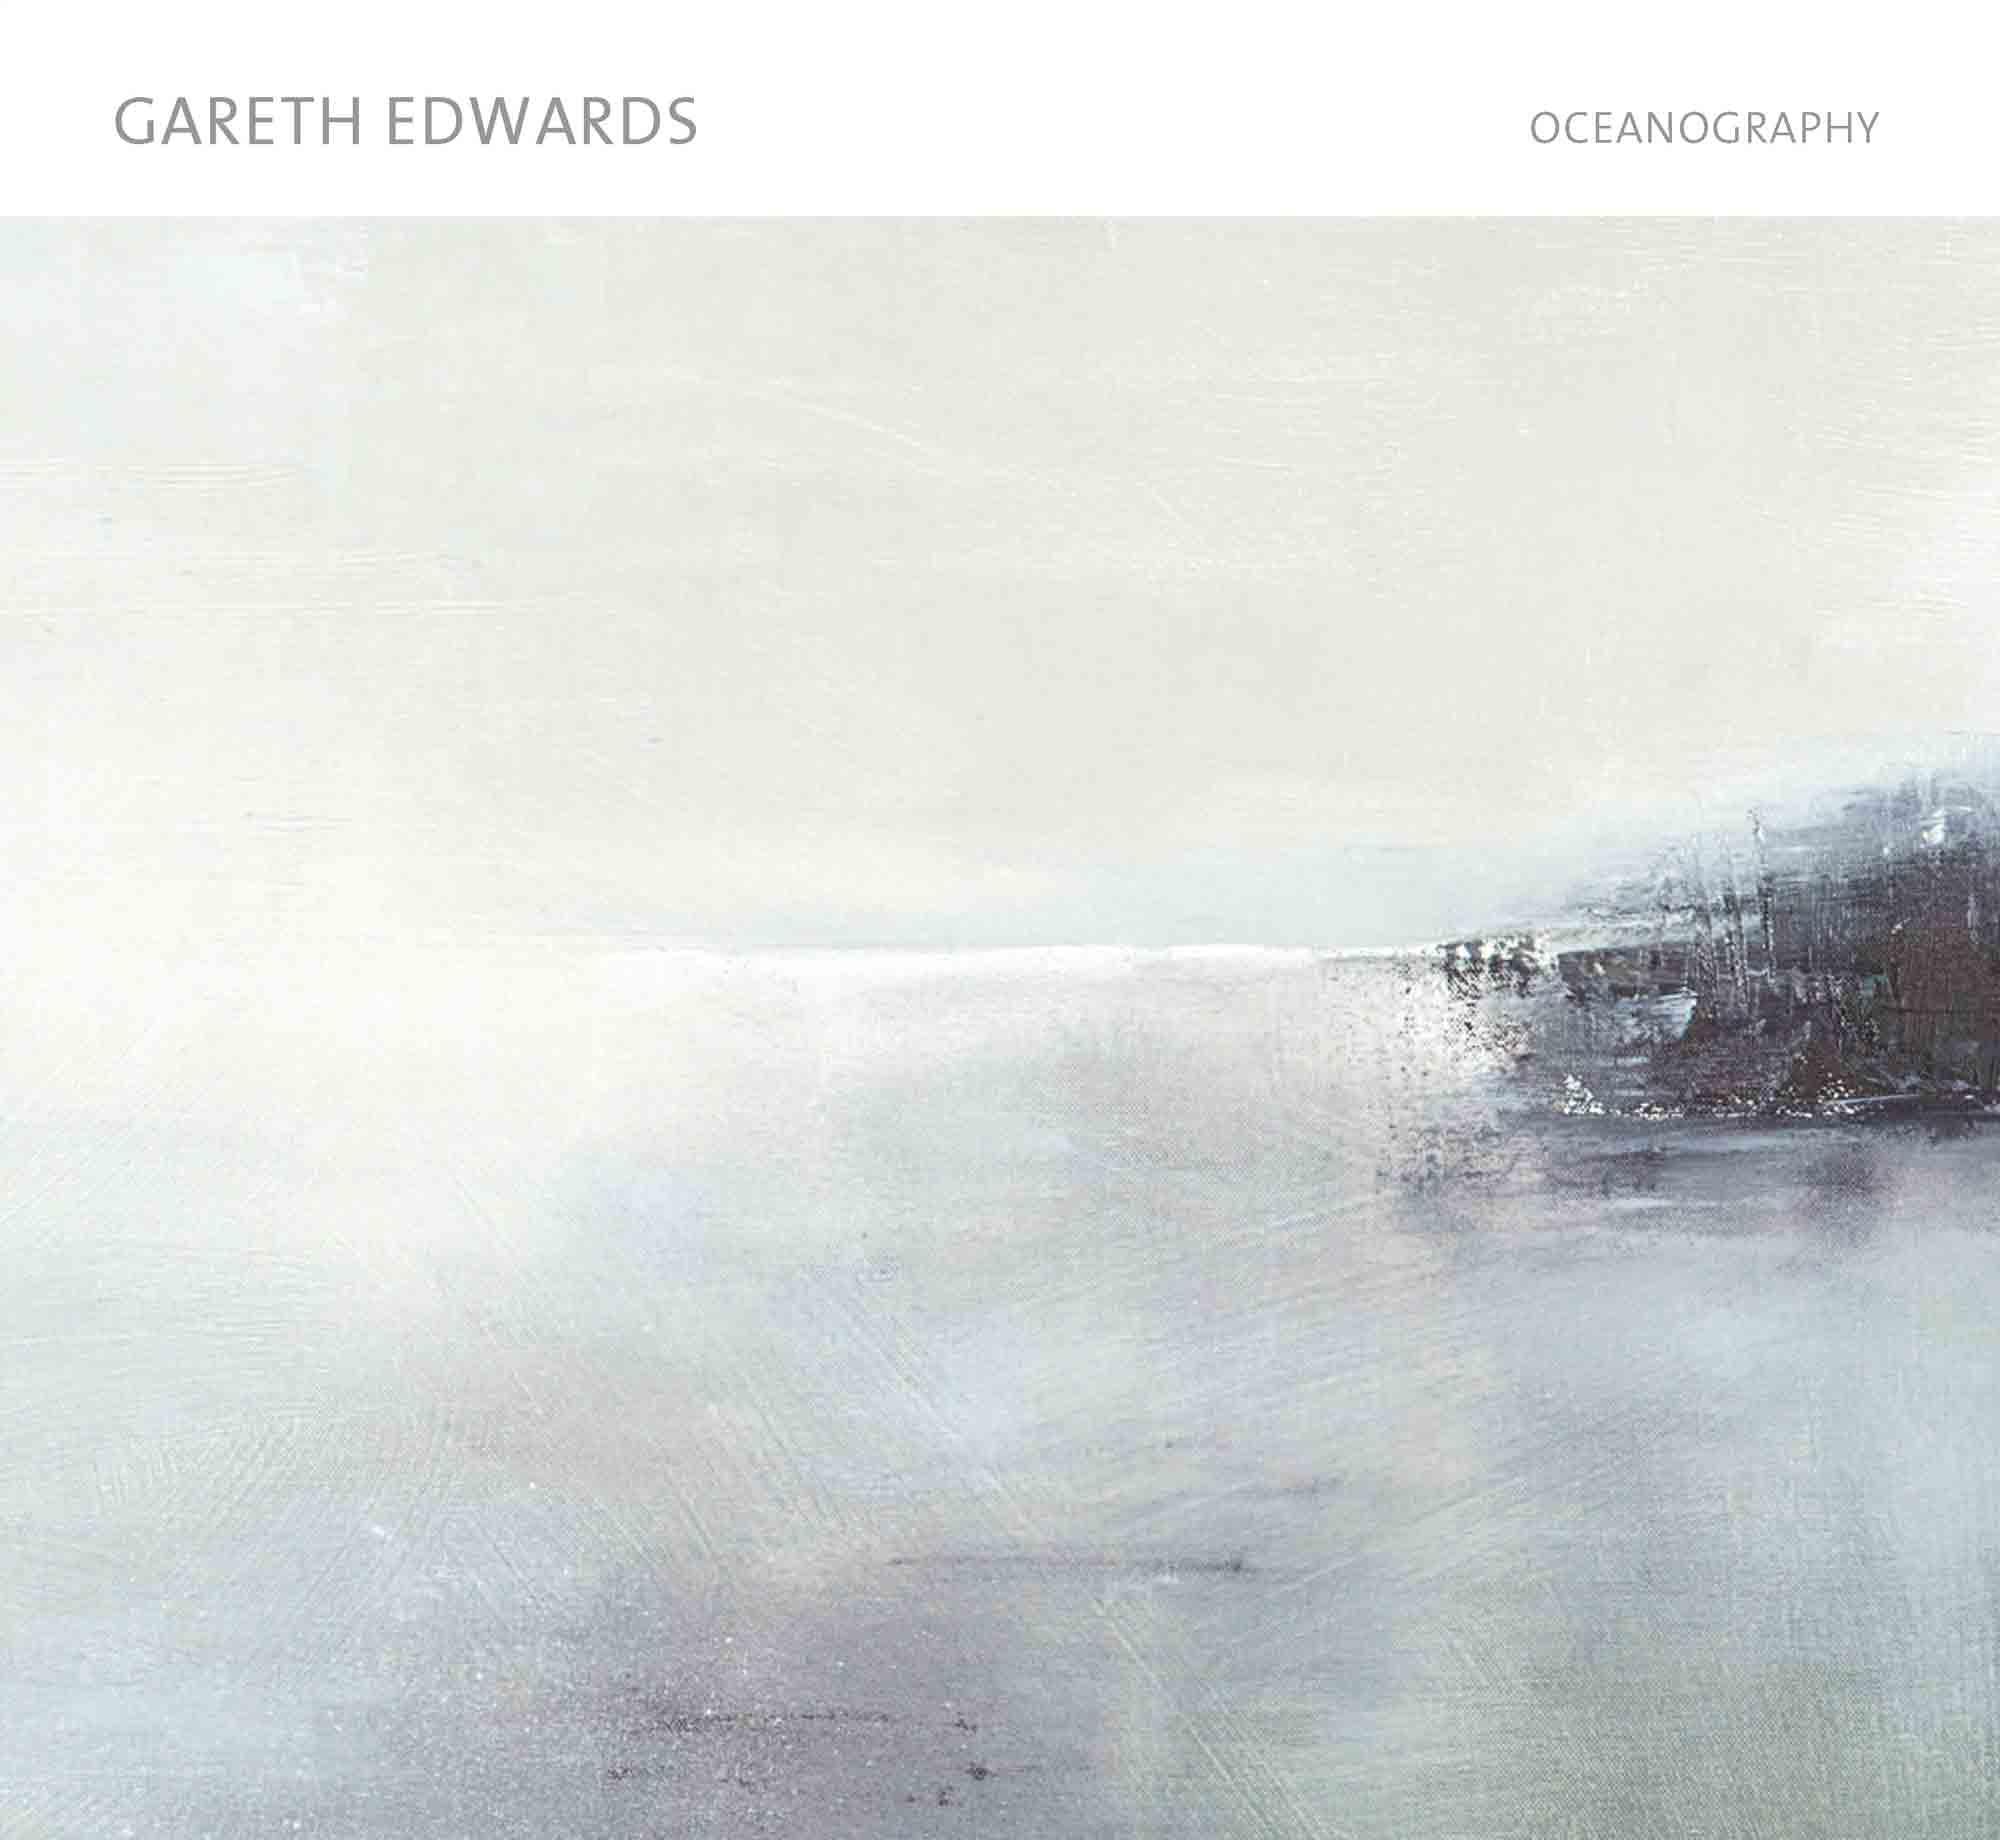 Gareth Edwards Oceanography Publication